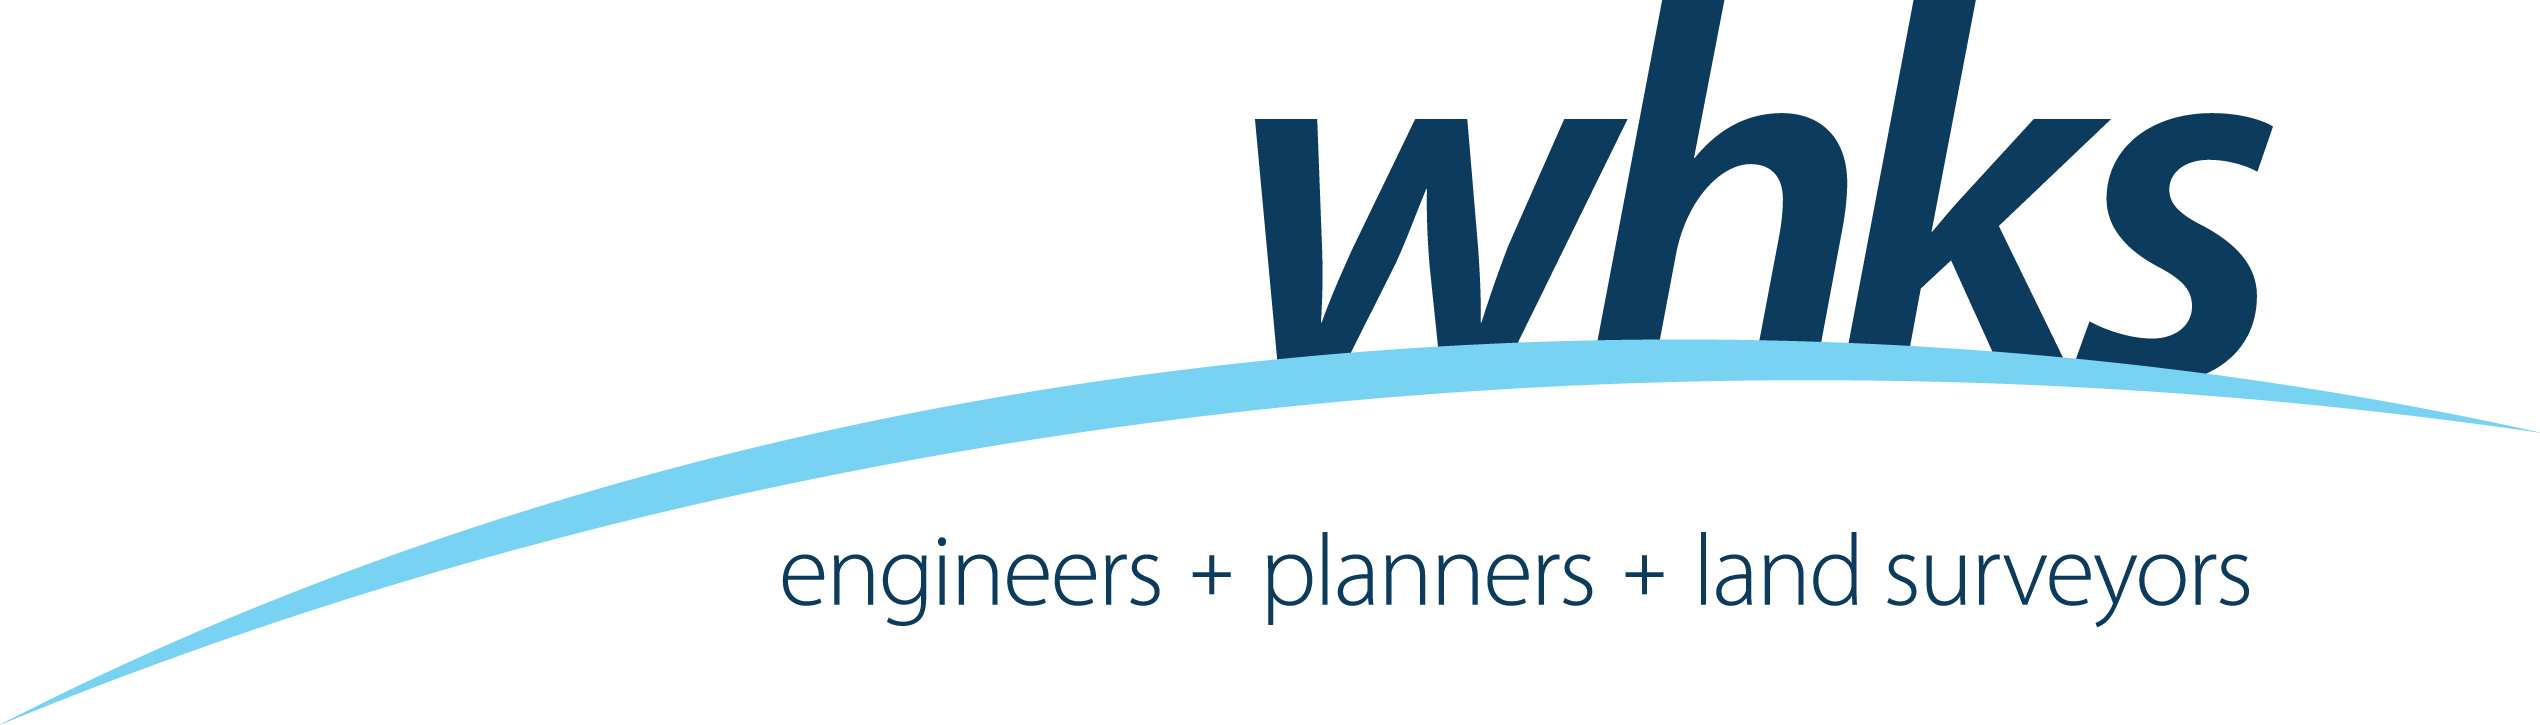 WHKS Logo